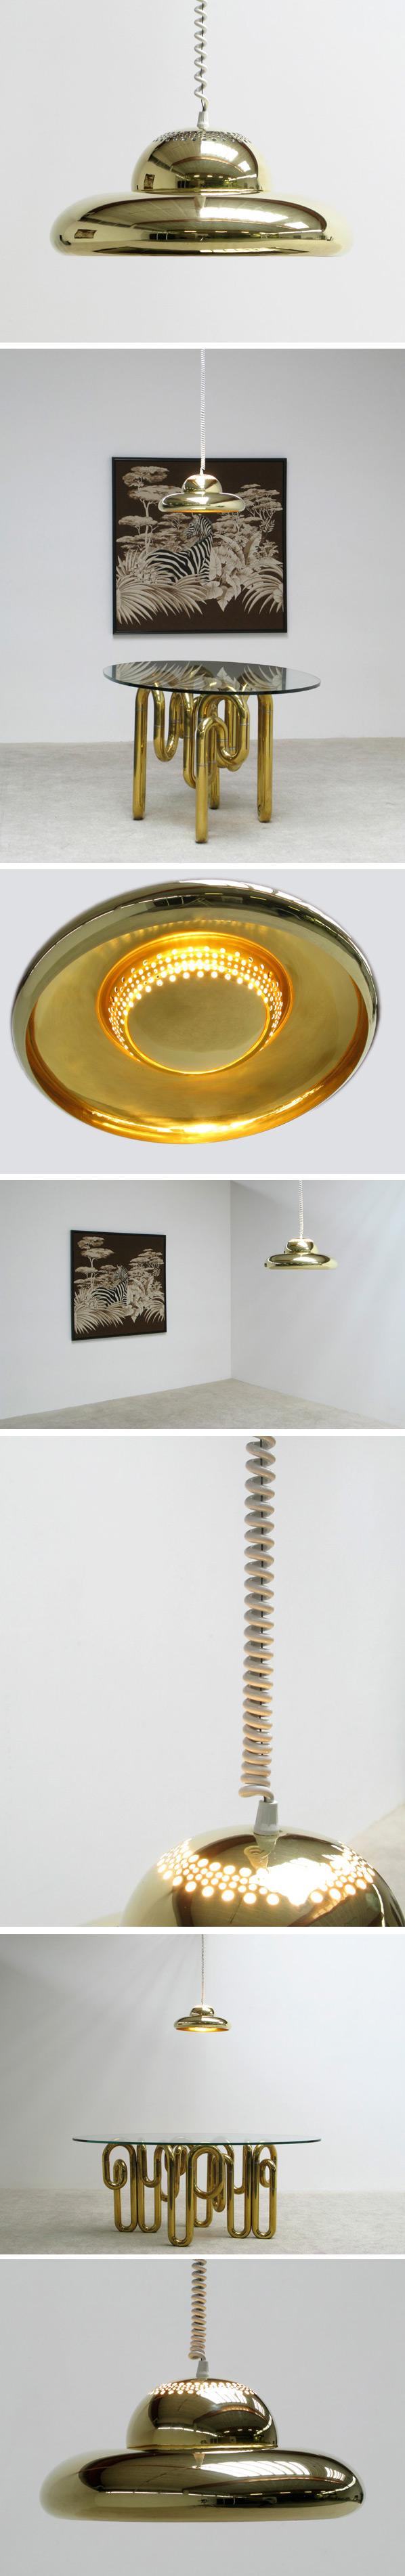 Tobia Scarpa Fior di loto ceiling lamp Large